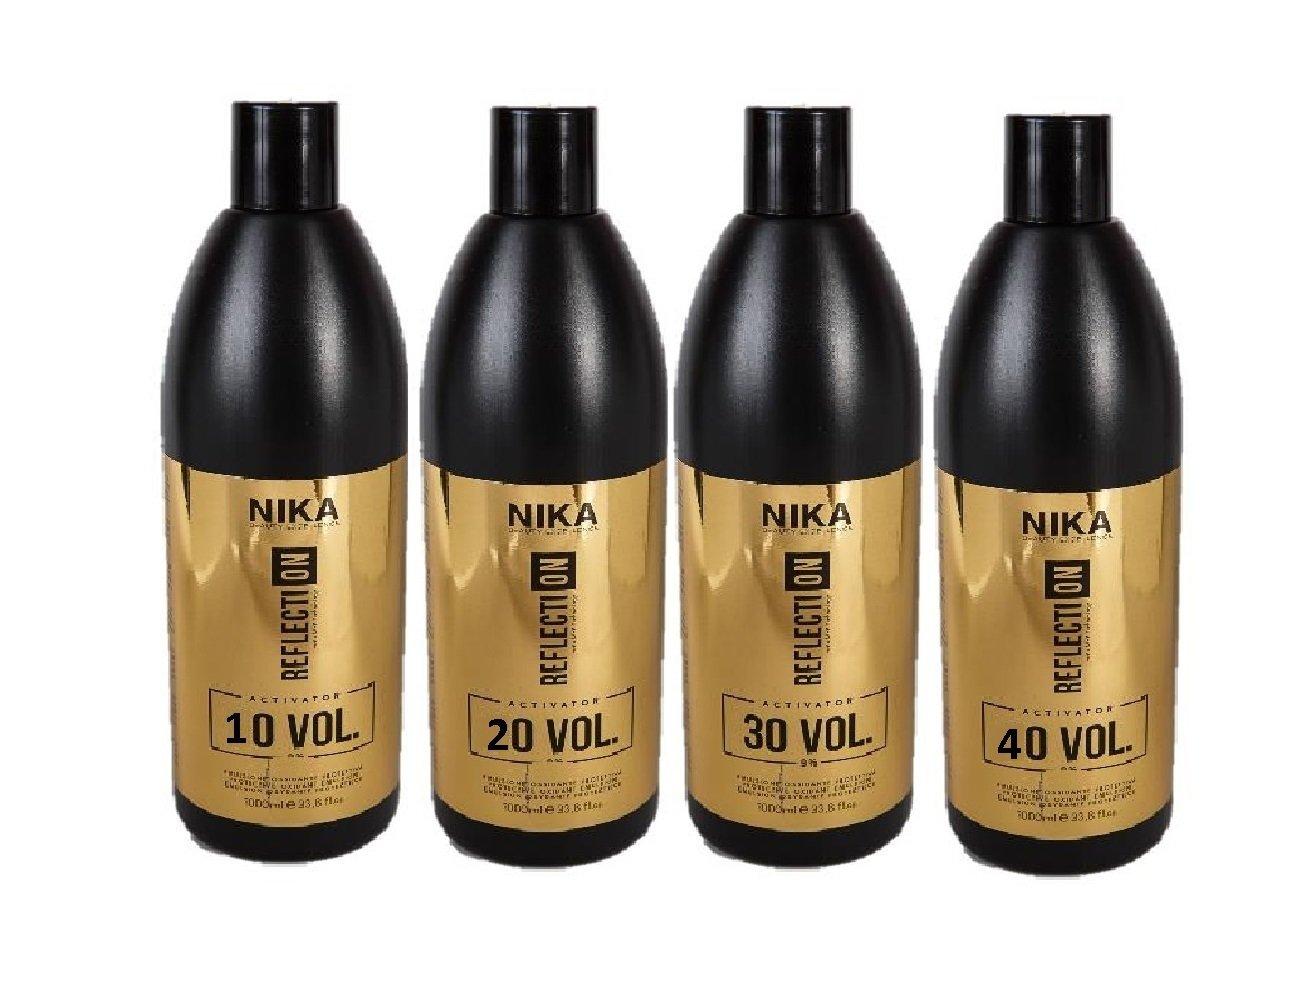 Косметика для волос nika купить vov косметика купить в хабаровске